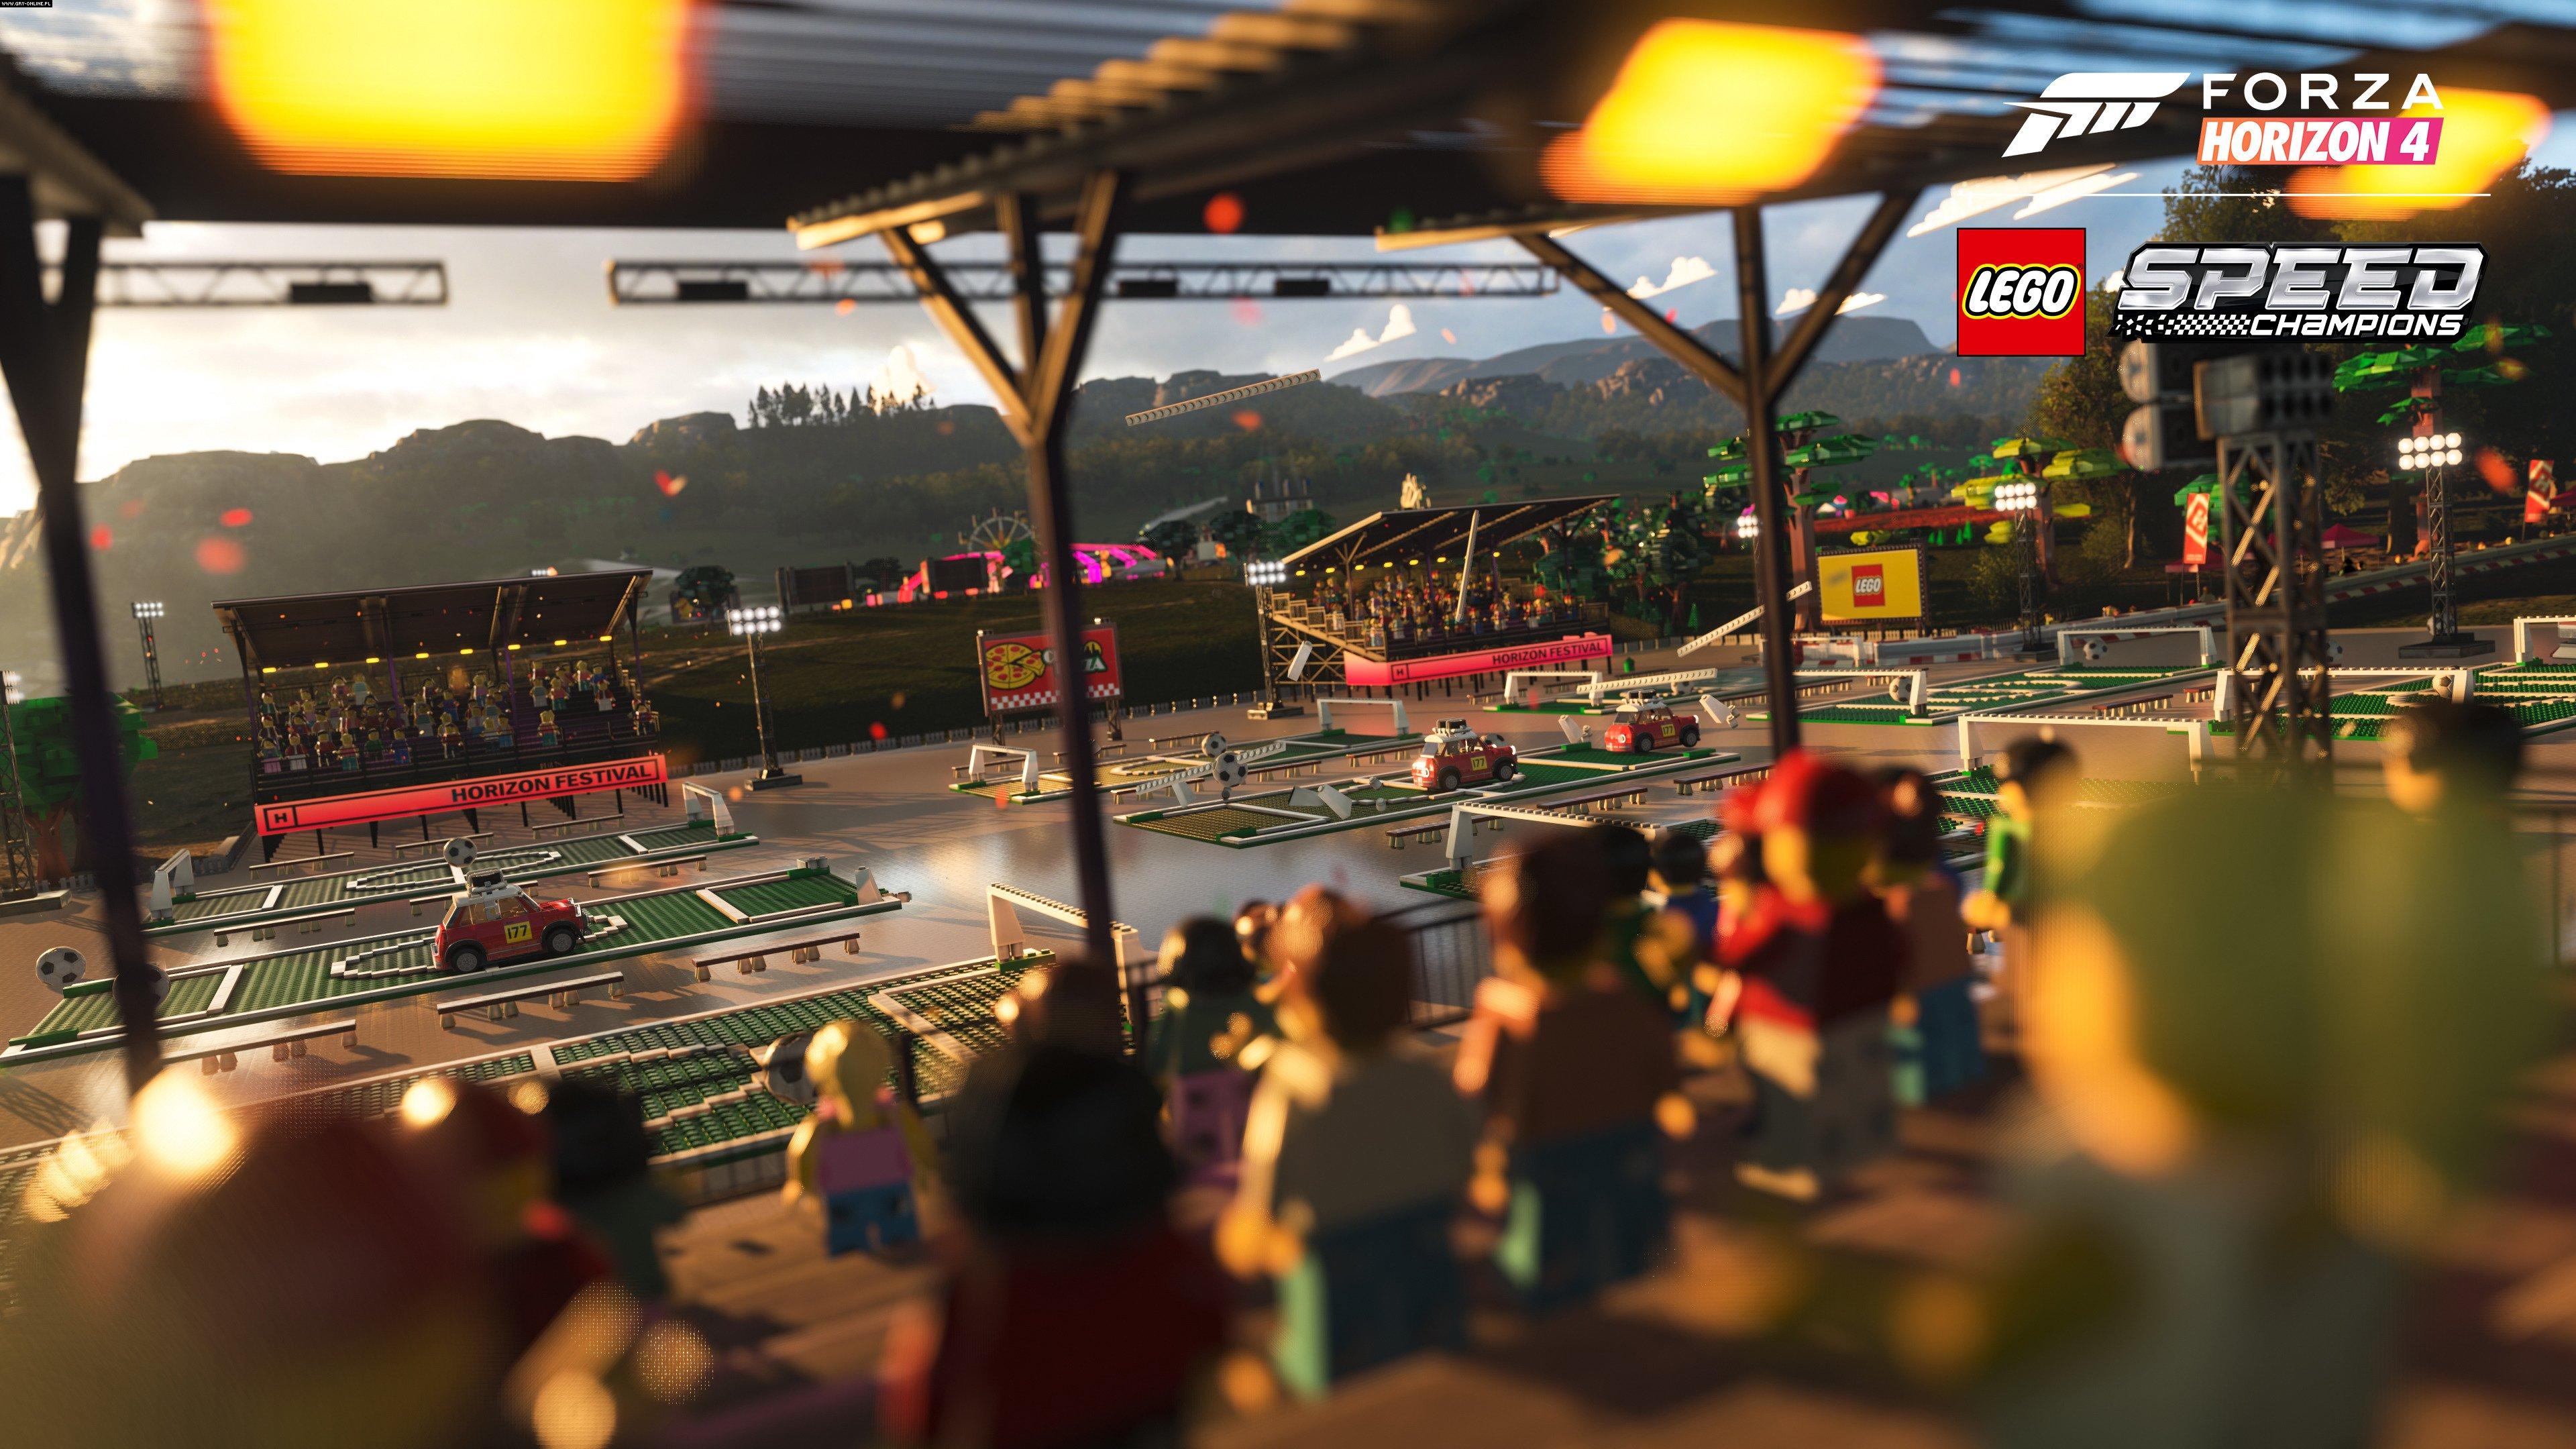 Forza Horizon 4: LEGO Speed Champions PC Download, foto: reprodução